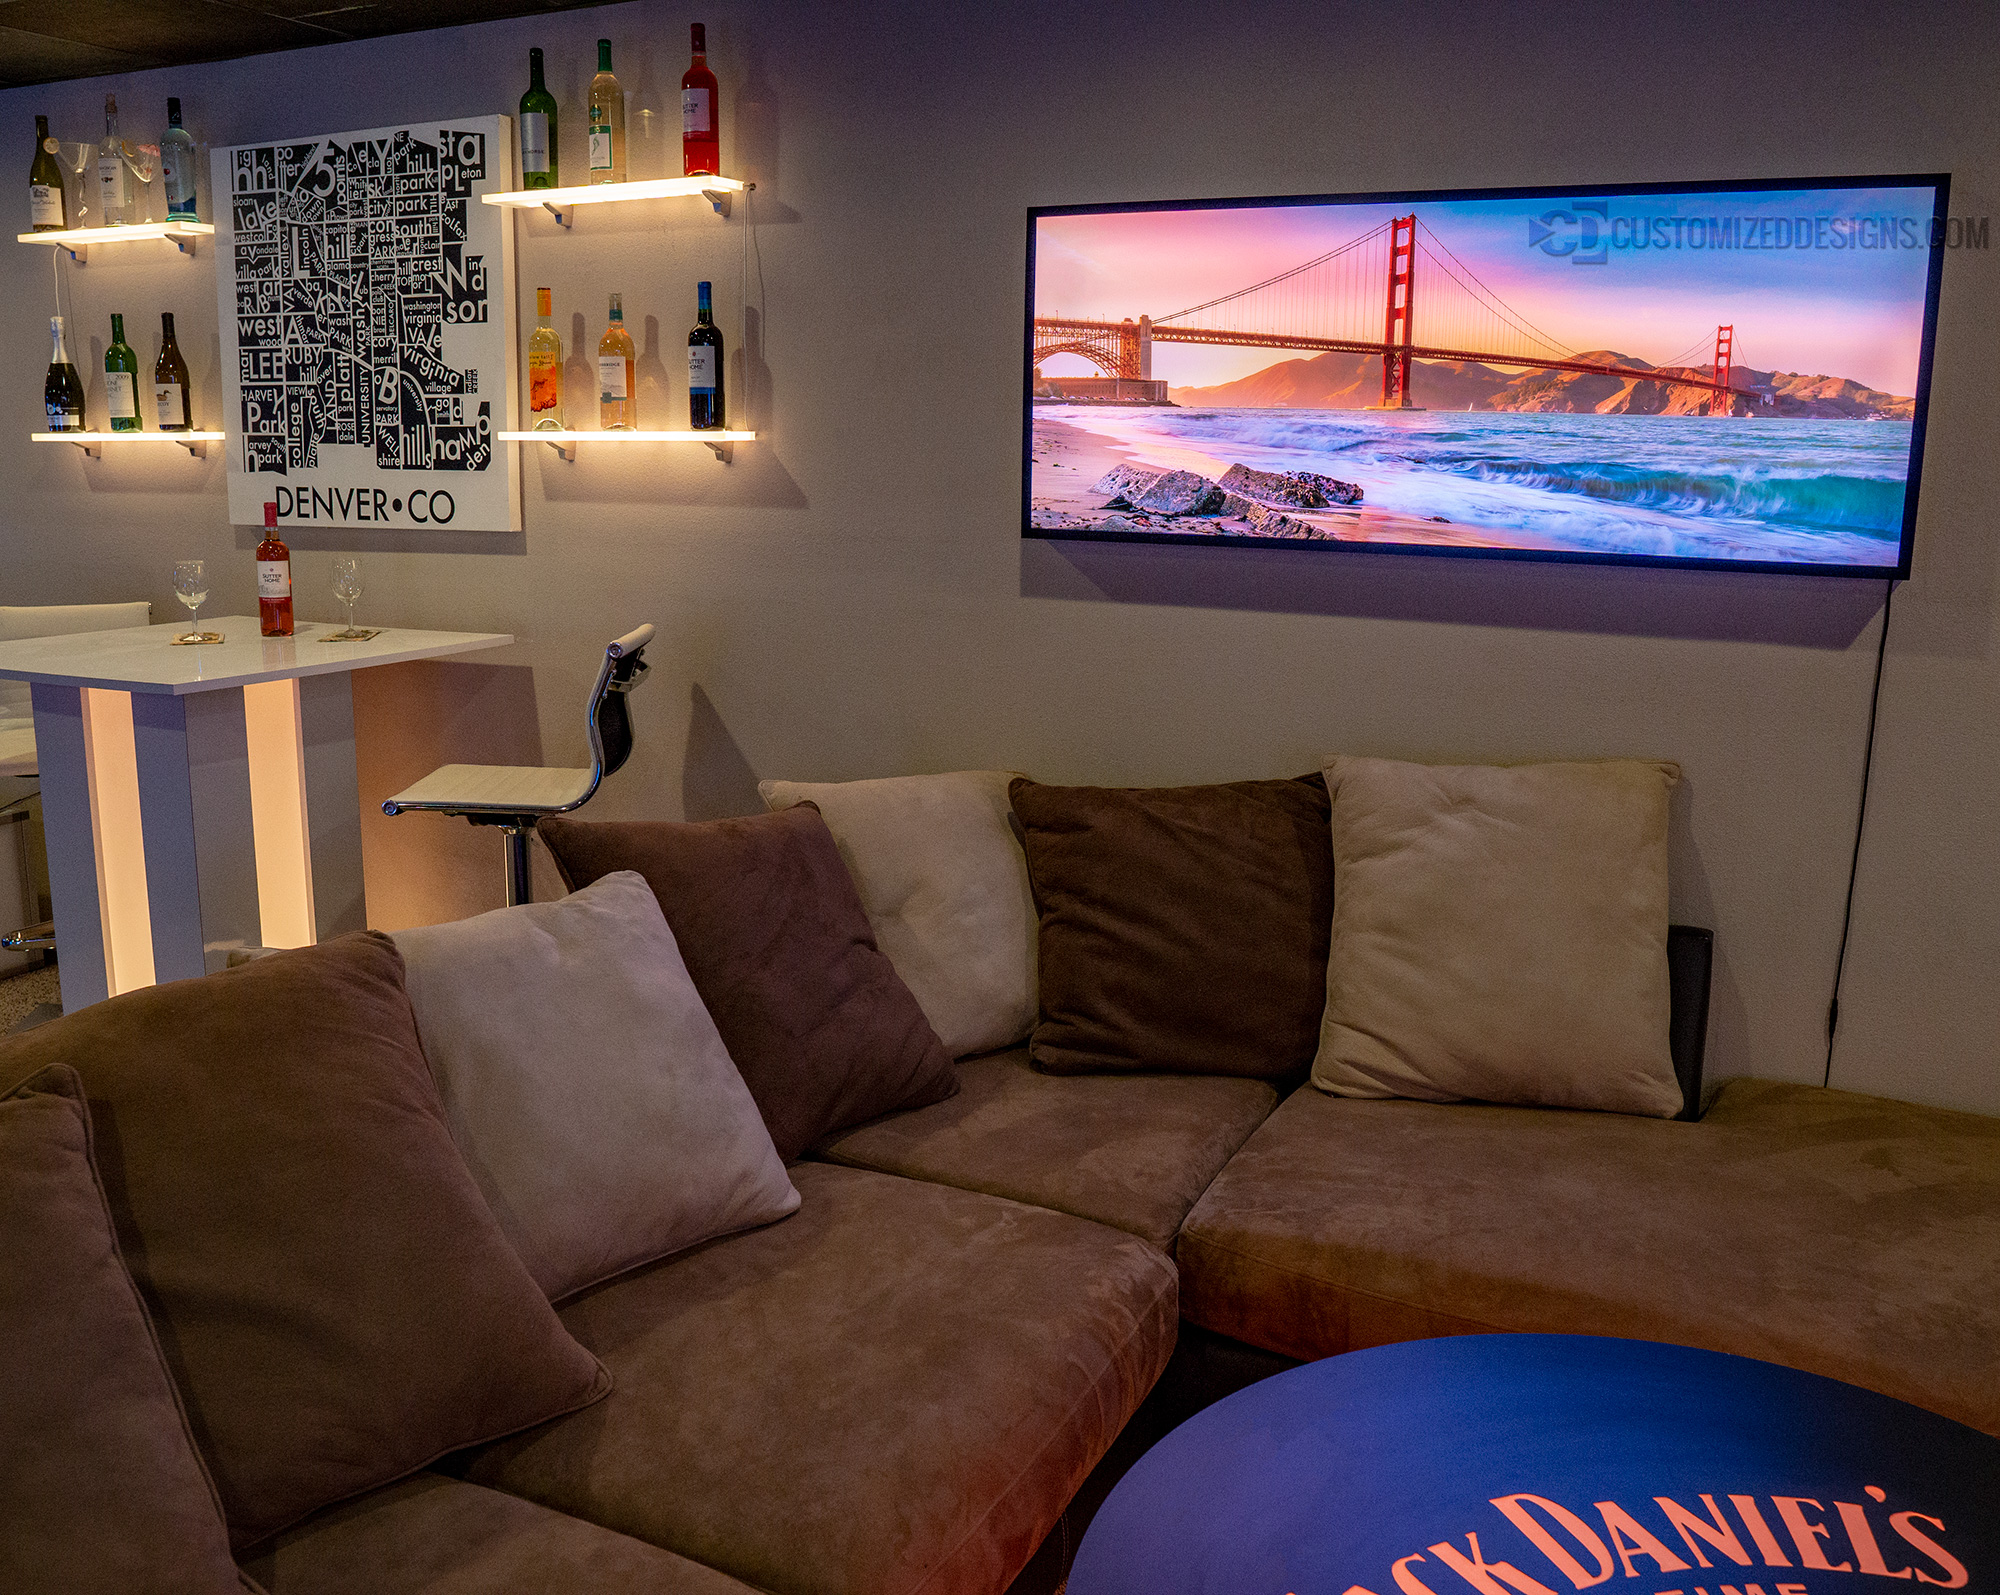 San Francisco Golden Gate Bridge Lighted Picture